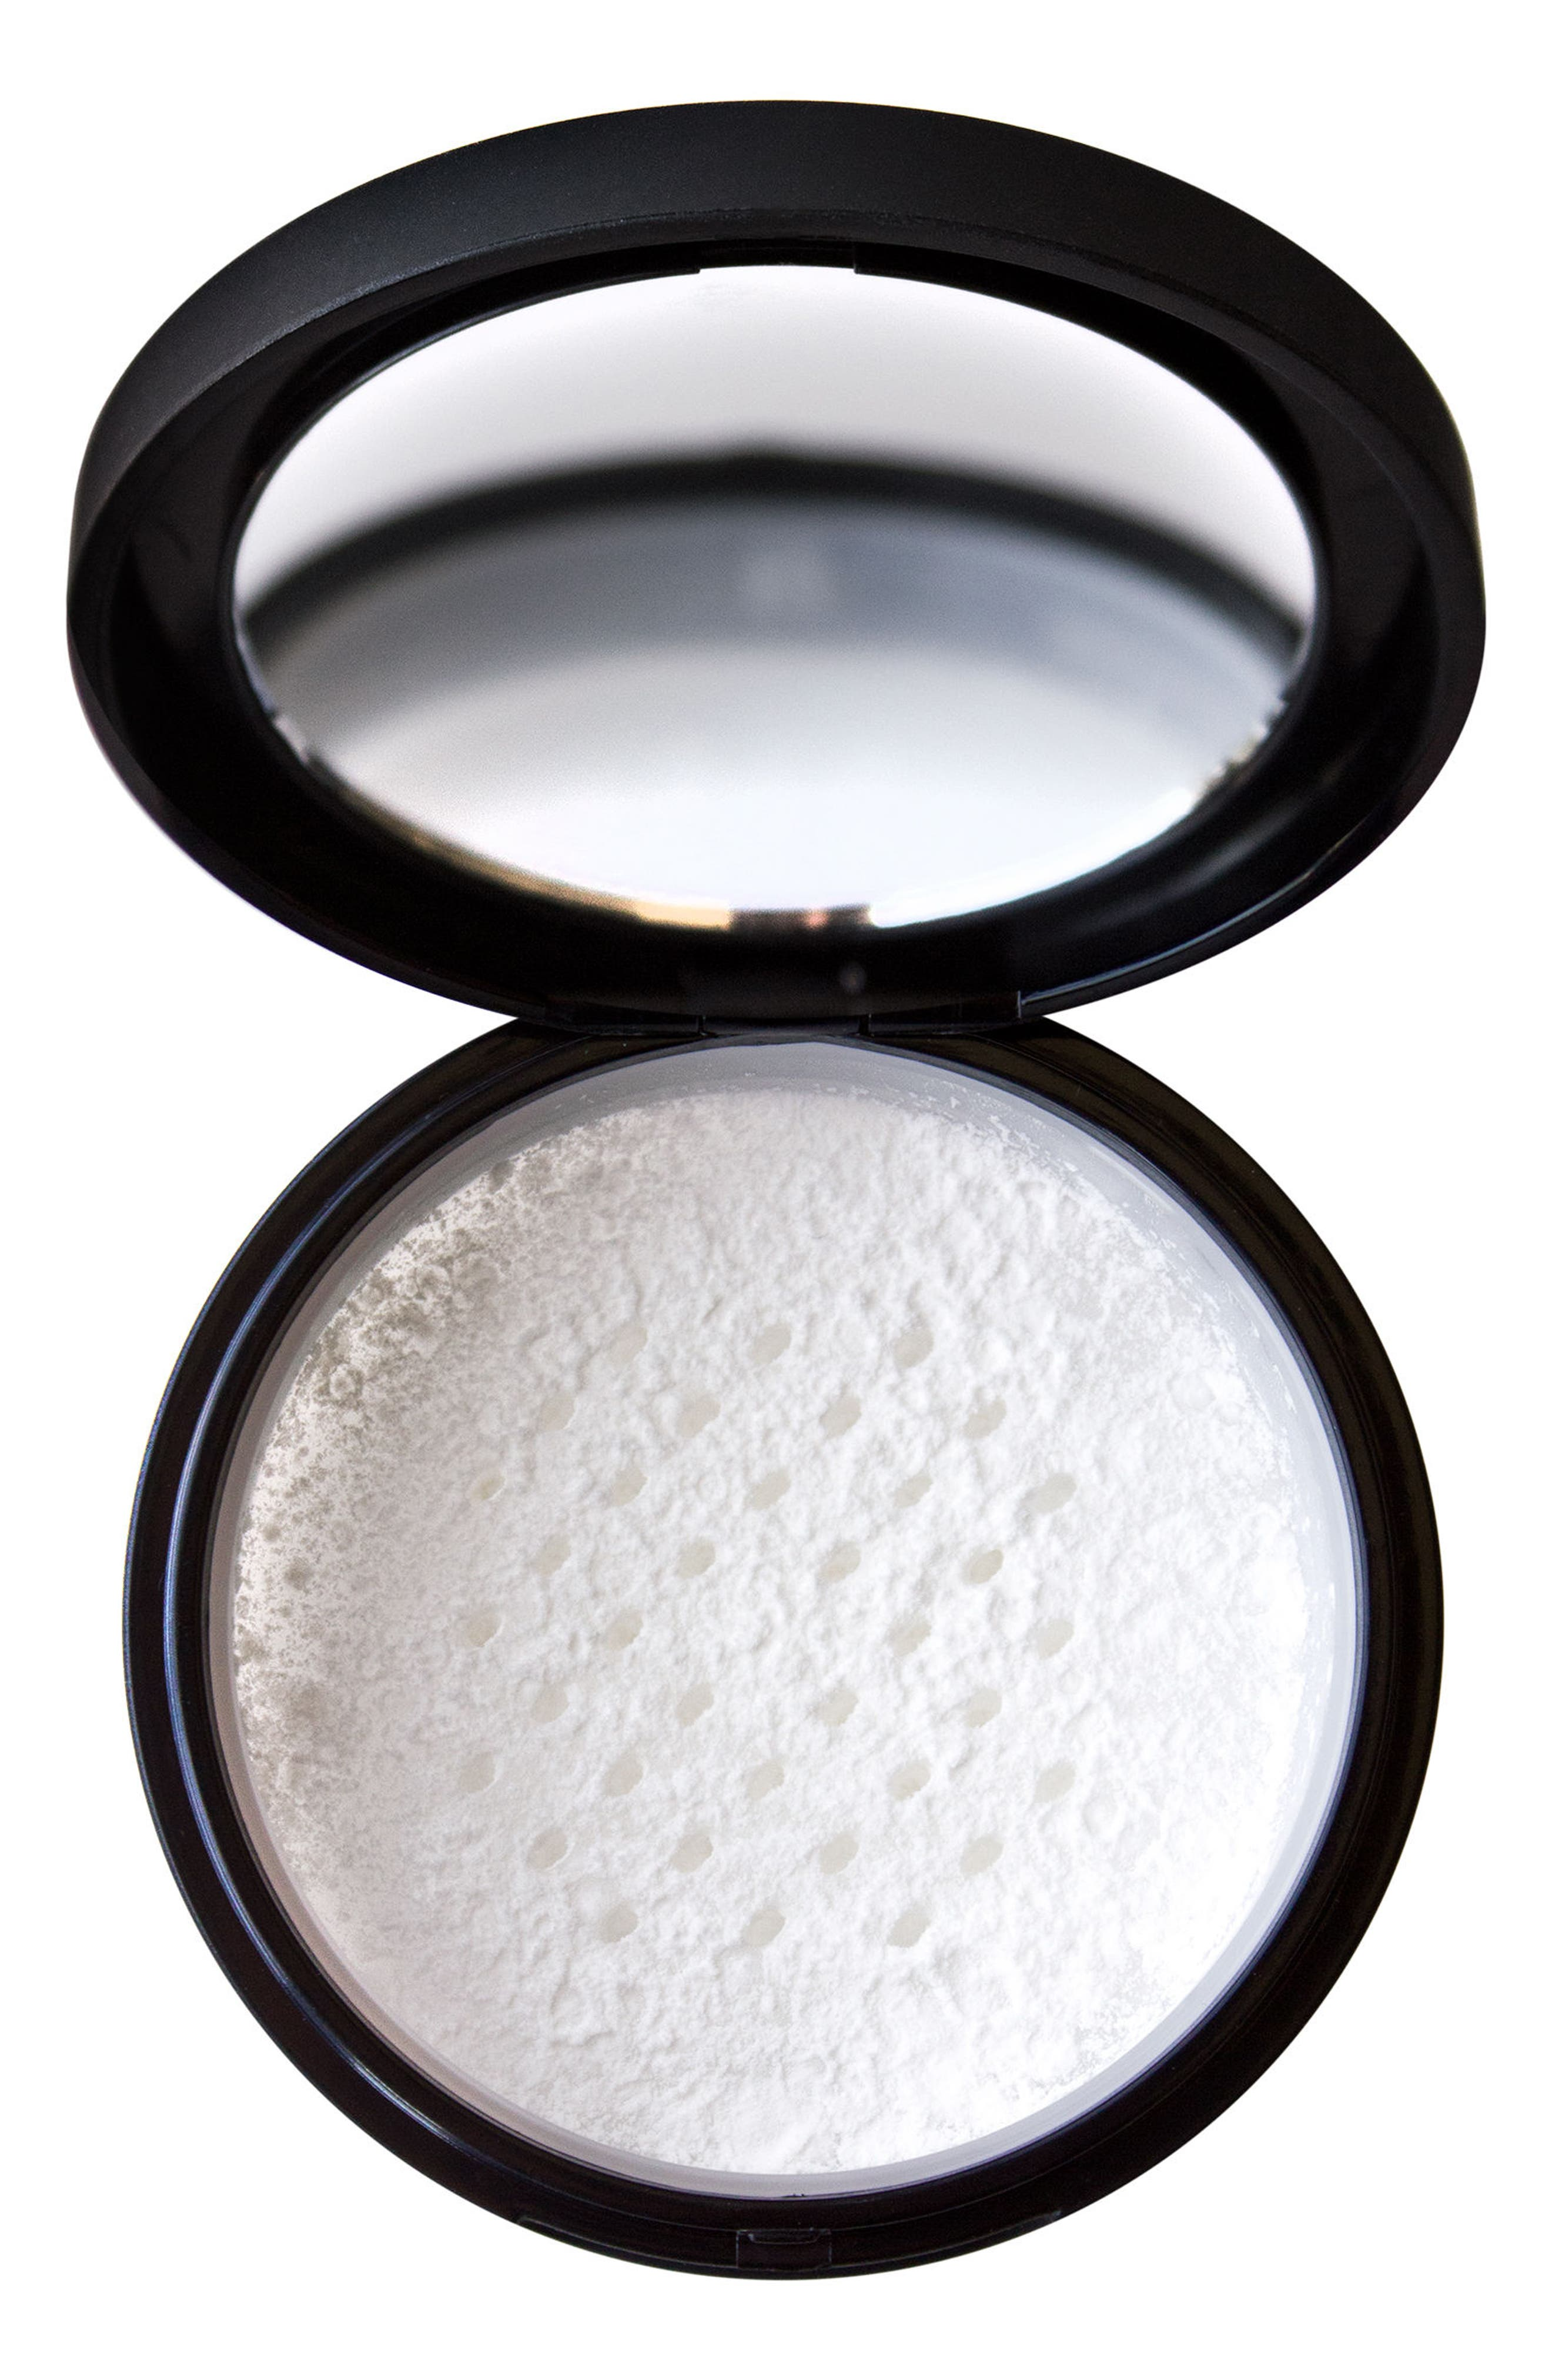 Main Image - LORAC PRO Blurring Translucent Loose Powder